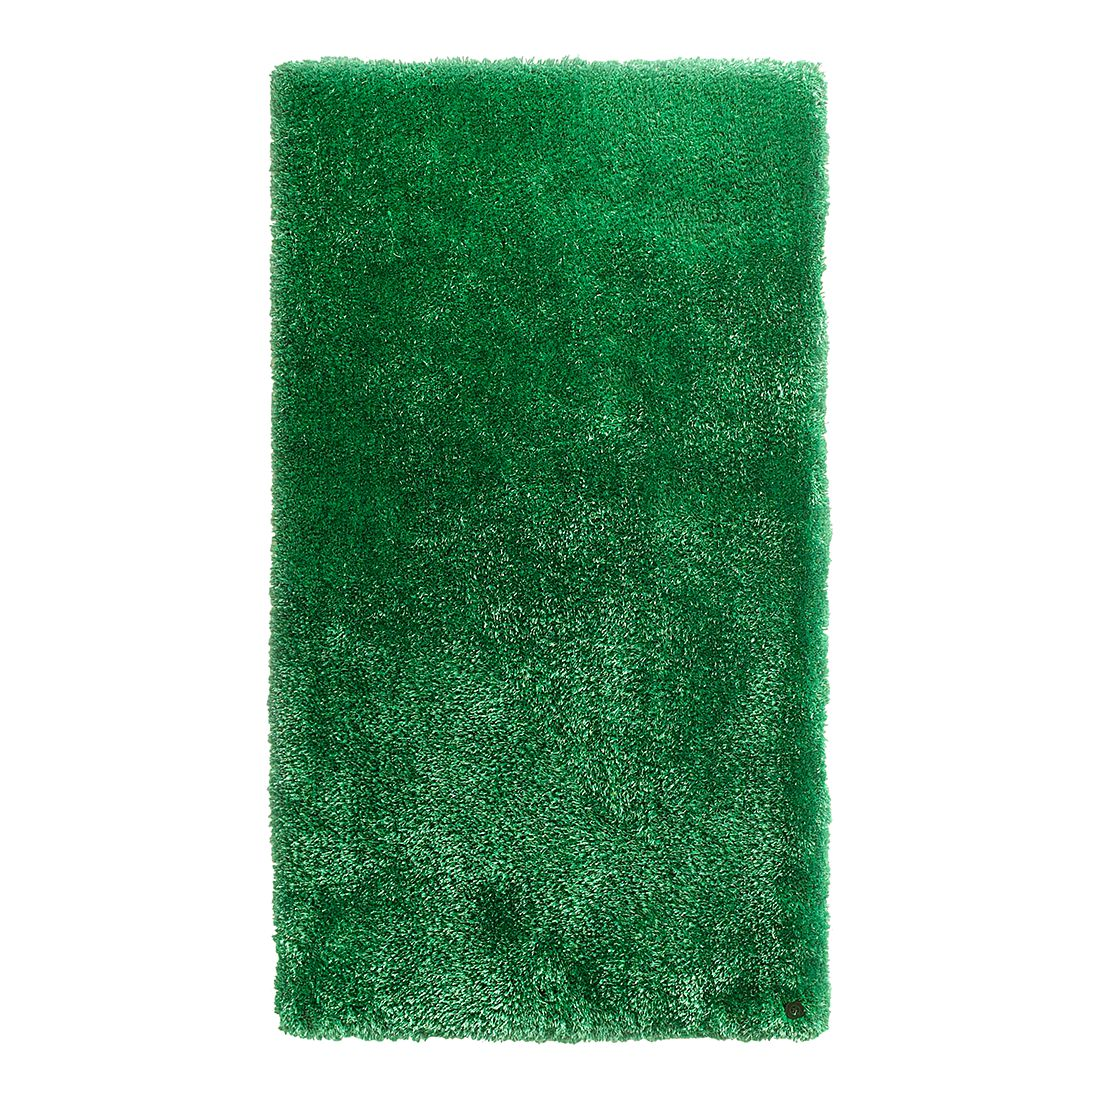 Teppich Soft Square – Grün – Maße: 65 x 135 cm, Tom Tailor günstig